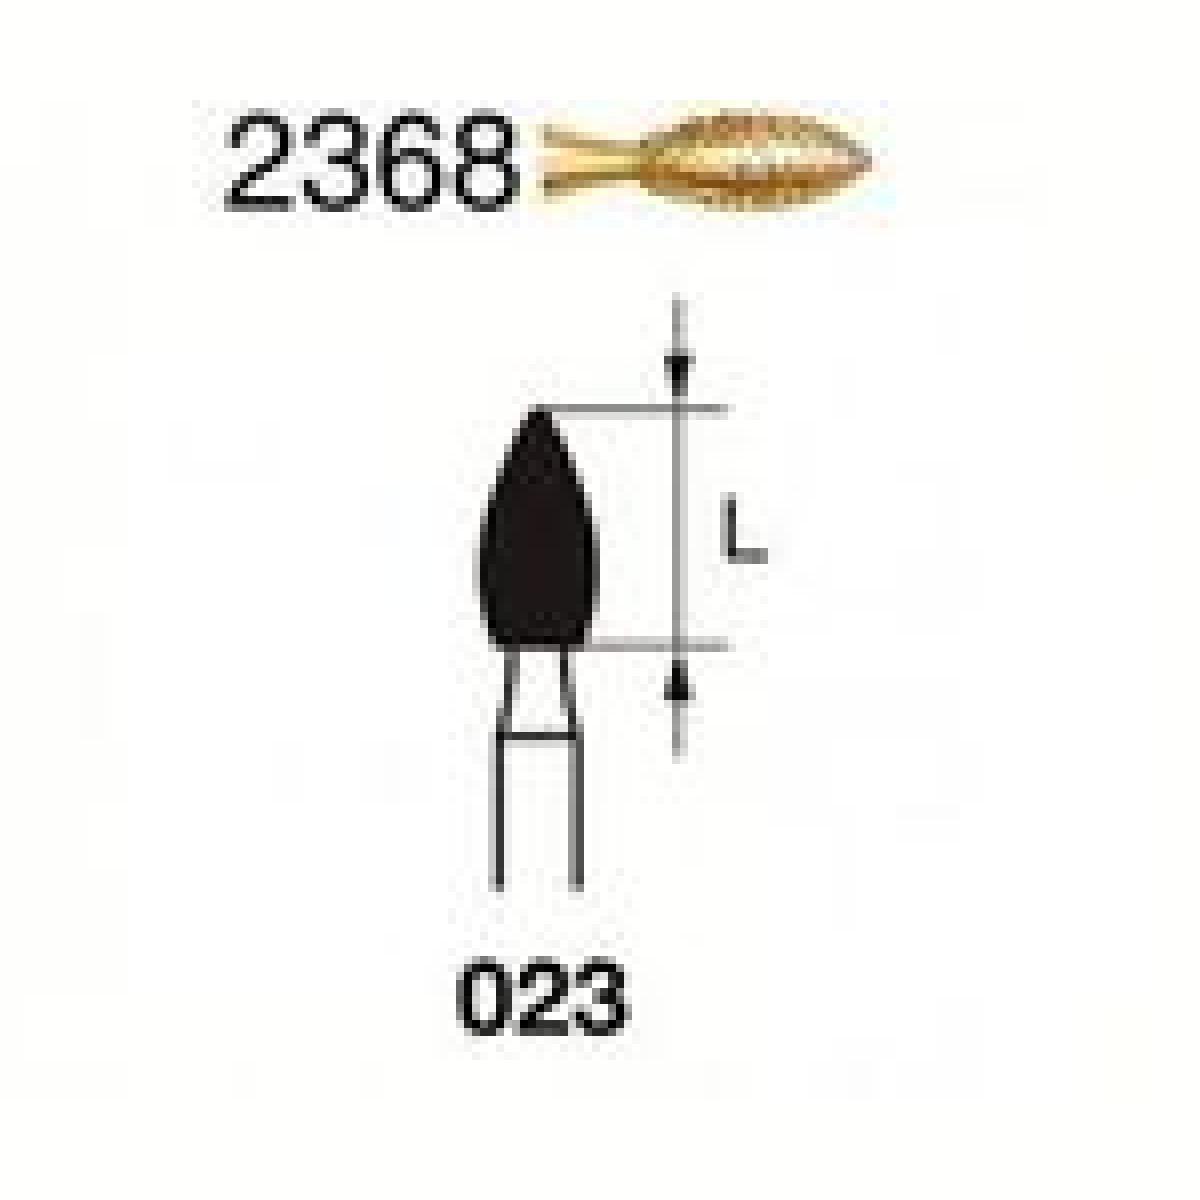 2368 314 023 FRESA DIAMANTE FG 2000 CX5 KOMET -